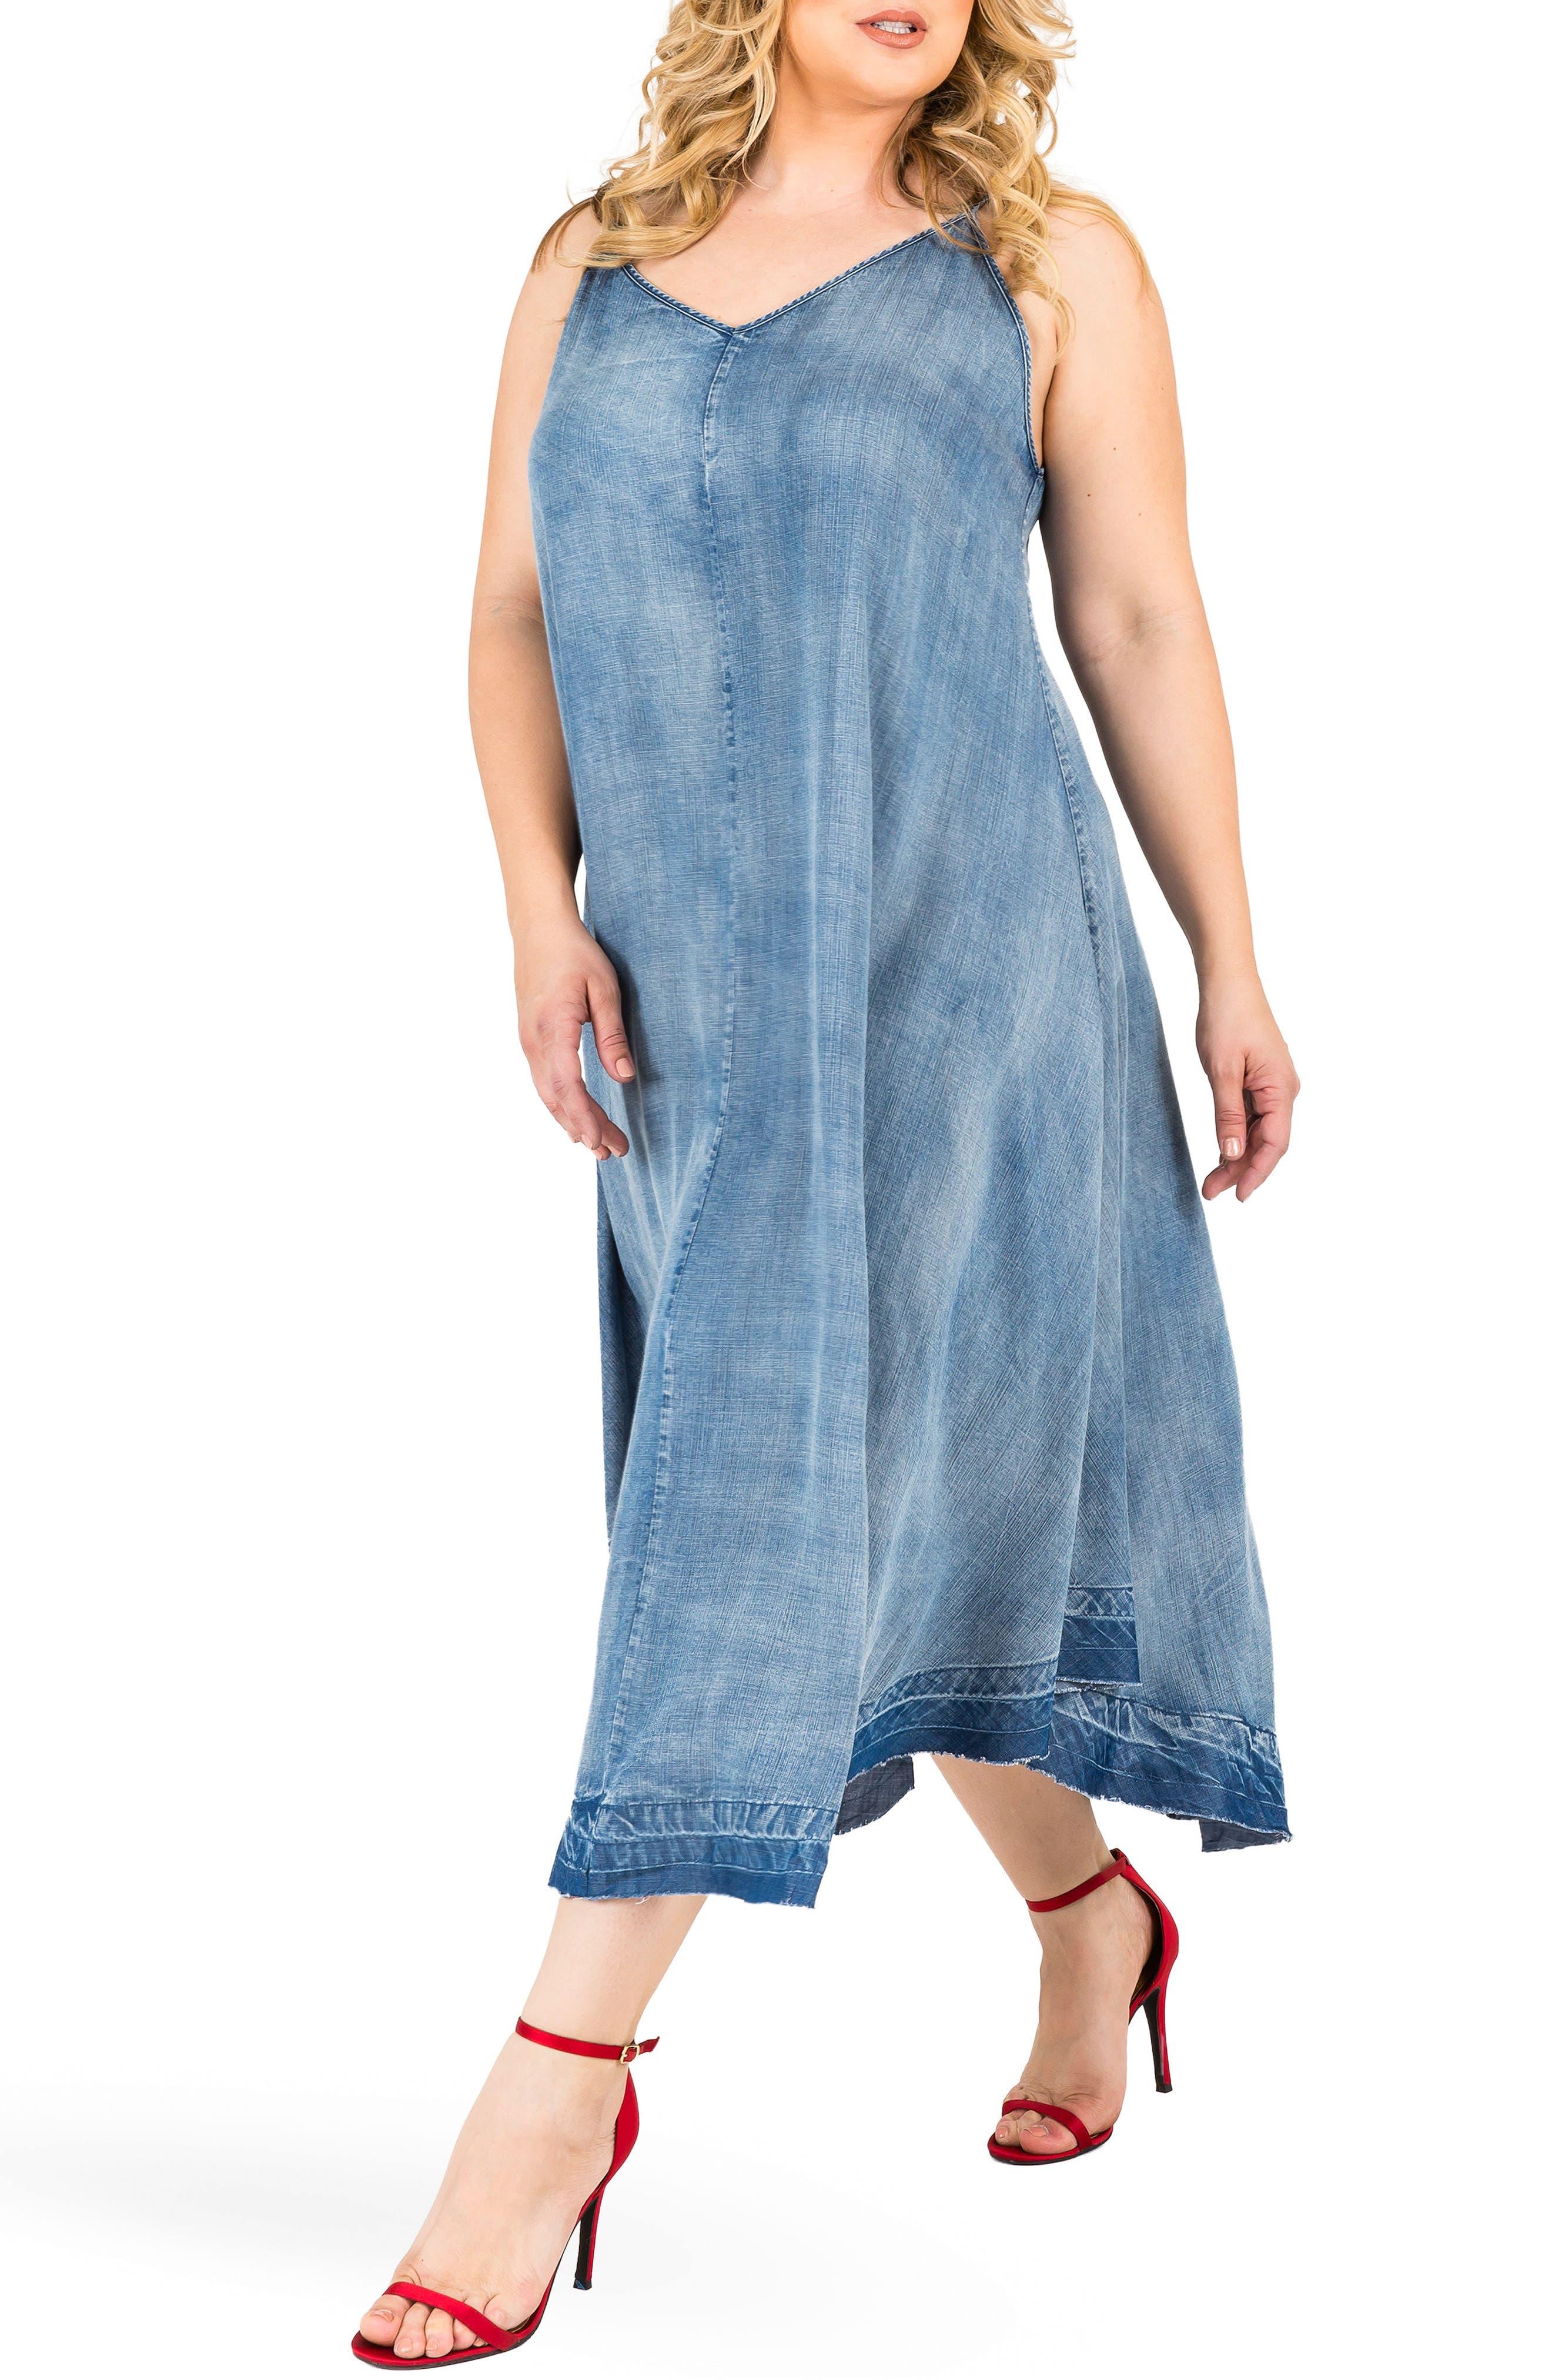 Taylor Tank Denim Midi Dress,                             Main thumbnail 1, color,                             MEDIUM BLUE